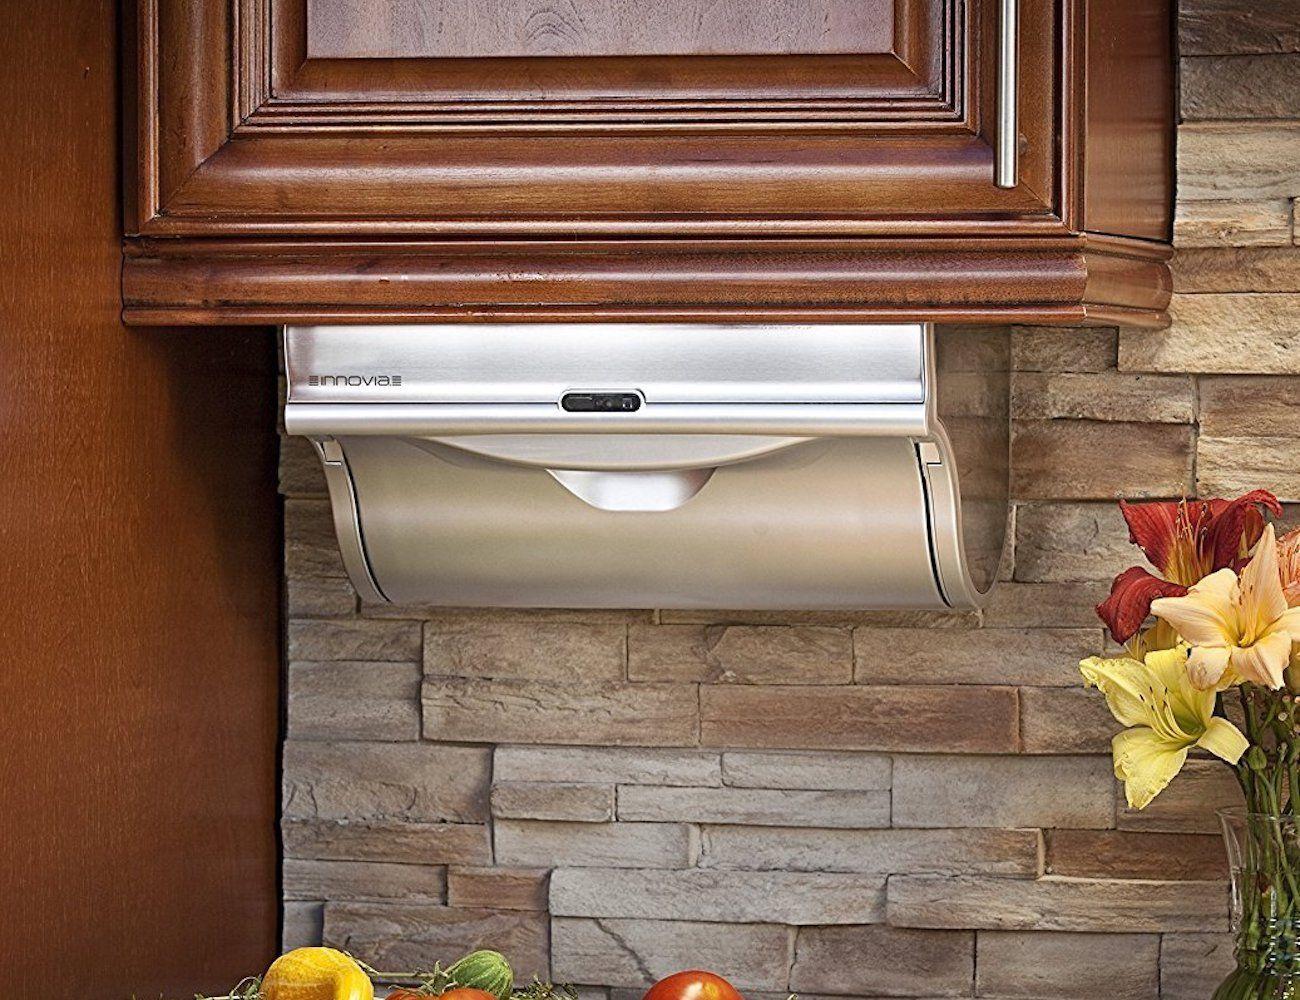 Beau Innovia Under Cabinet Paper Towel Dispenser